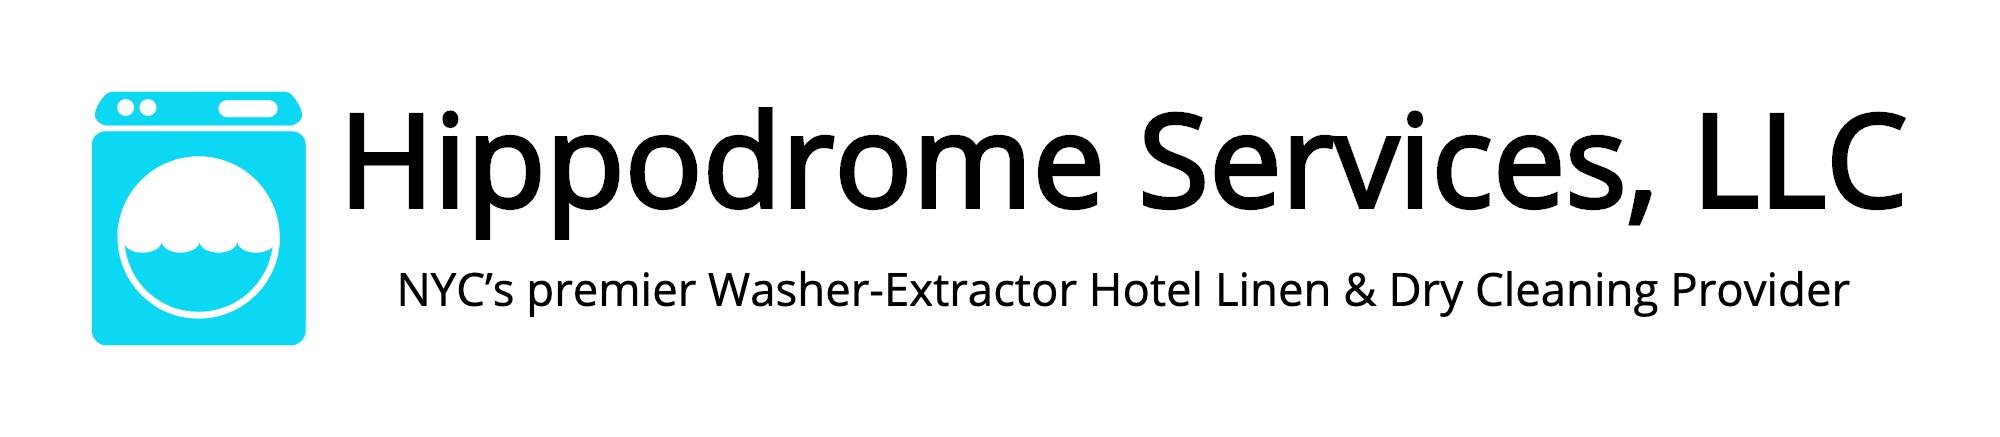 Hippodrome+Services%2C+LLC-logo.jpg